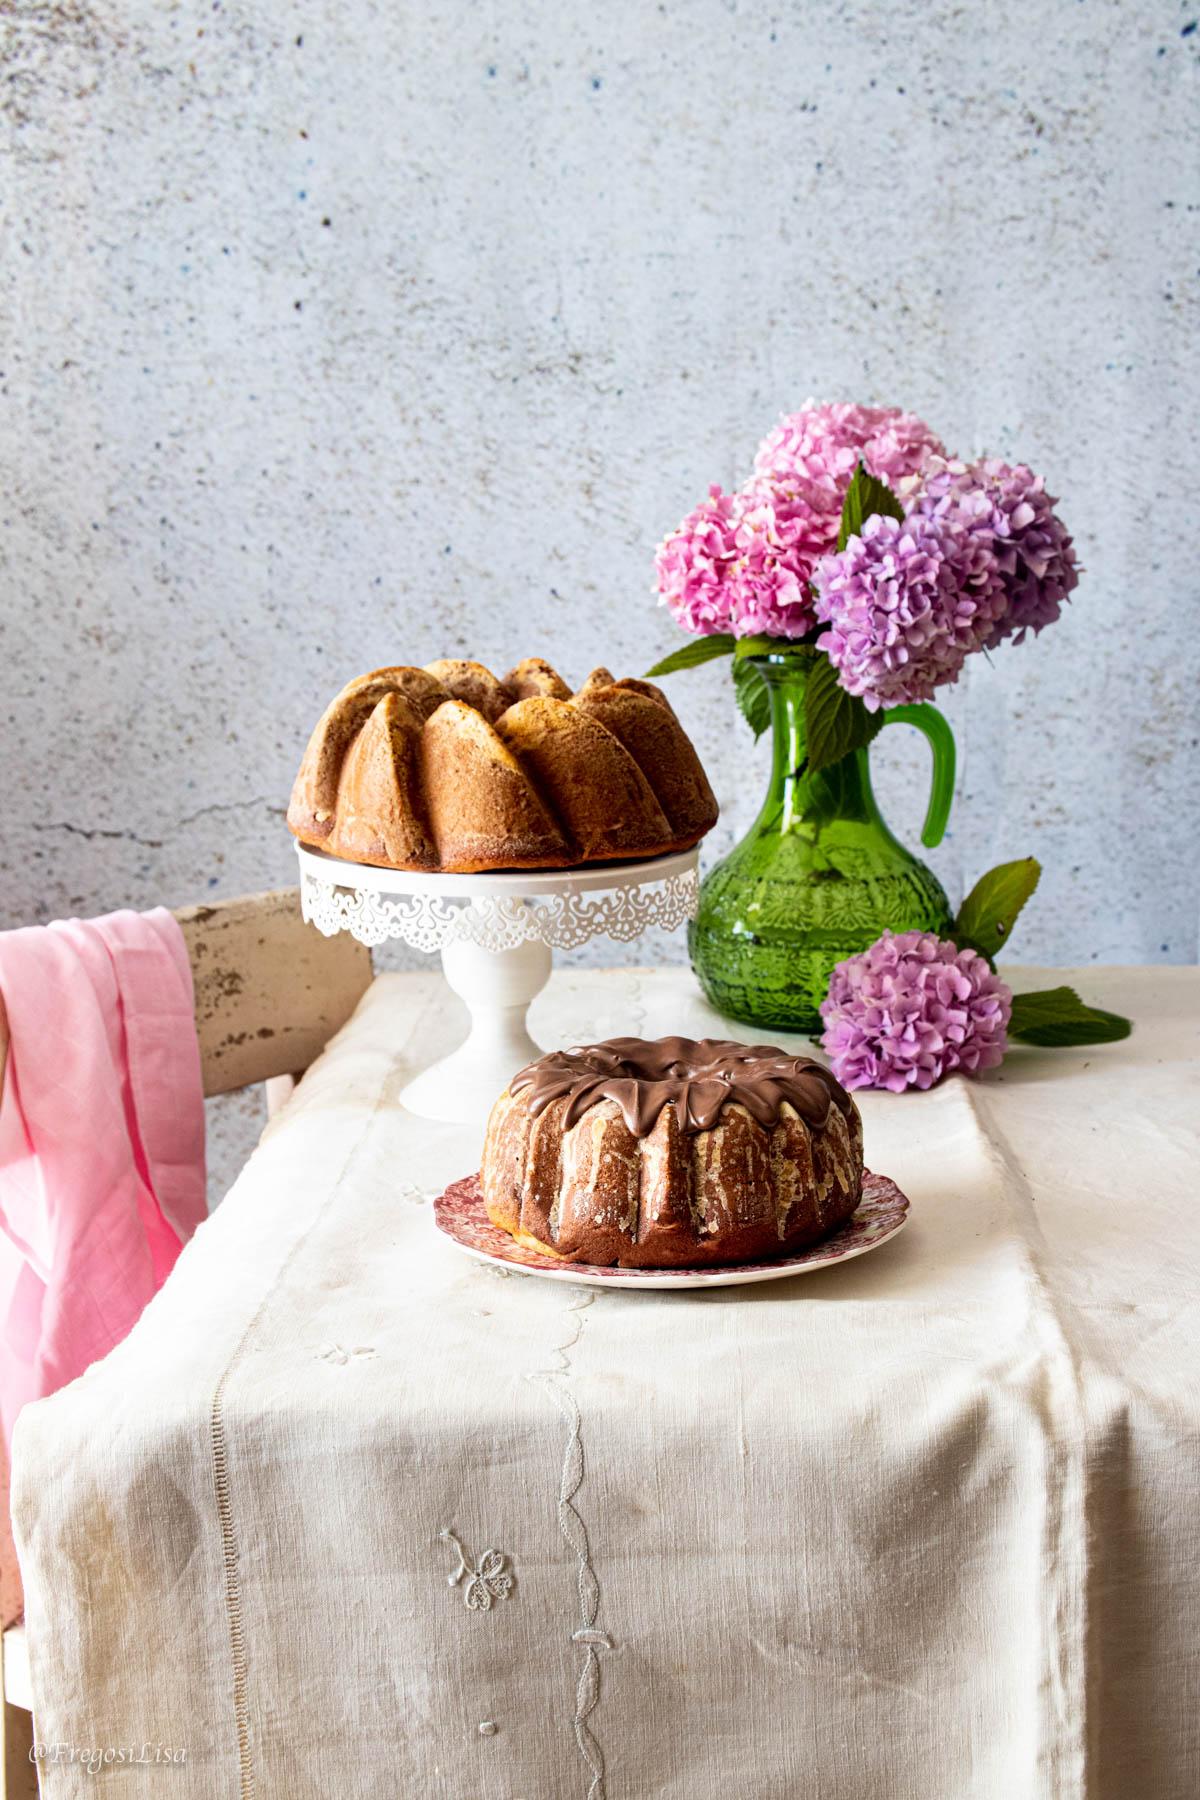 torta-abbraccio-ustic photography